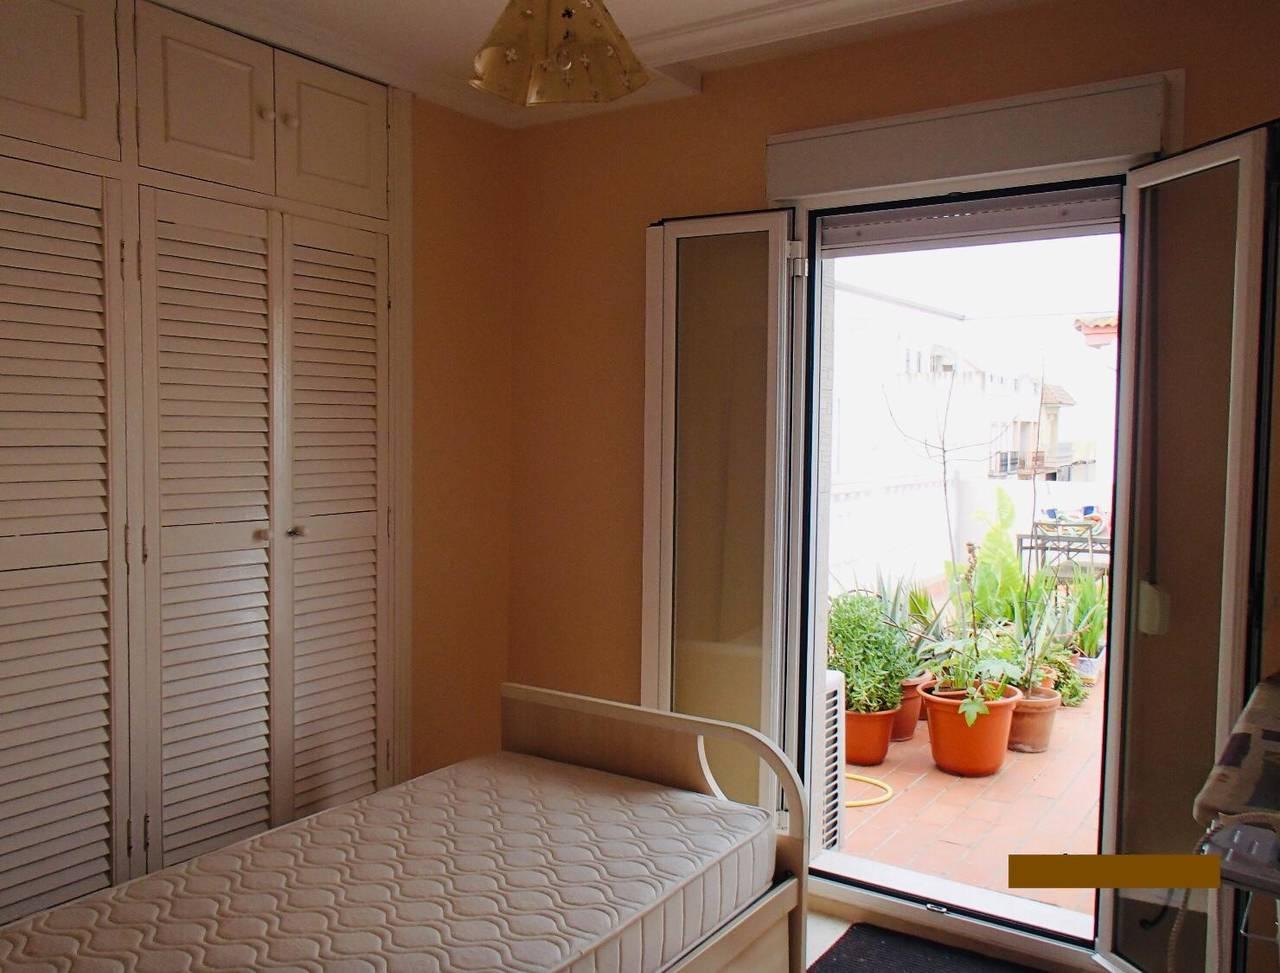 Particular alquila/vende preciosa casa adosada esquinera Coria del Rio  - Foto 5